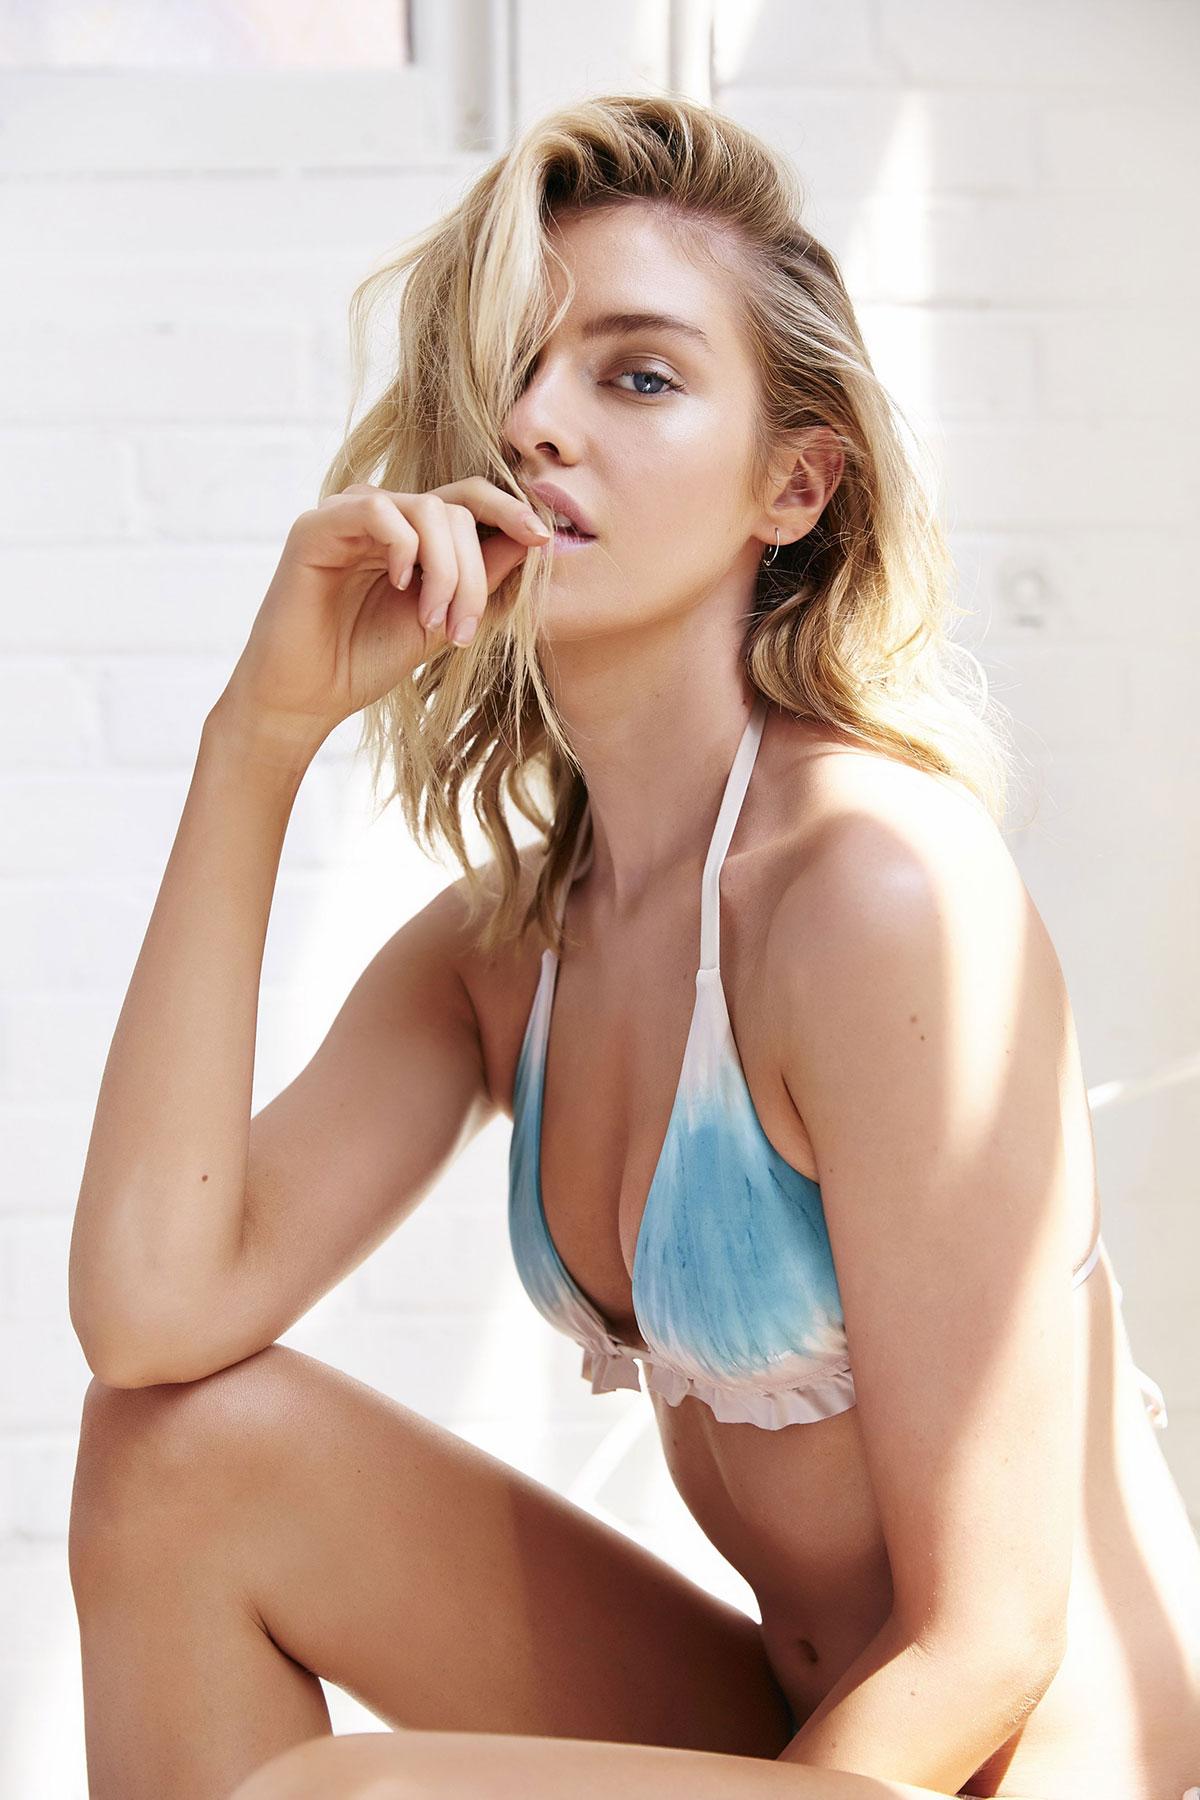 Bikini Kim Van der Laan naked (31 photo), Pussy, Sideboobs, Boobs, underwear 2019